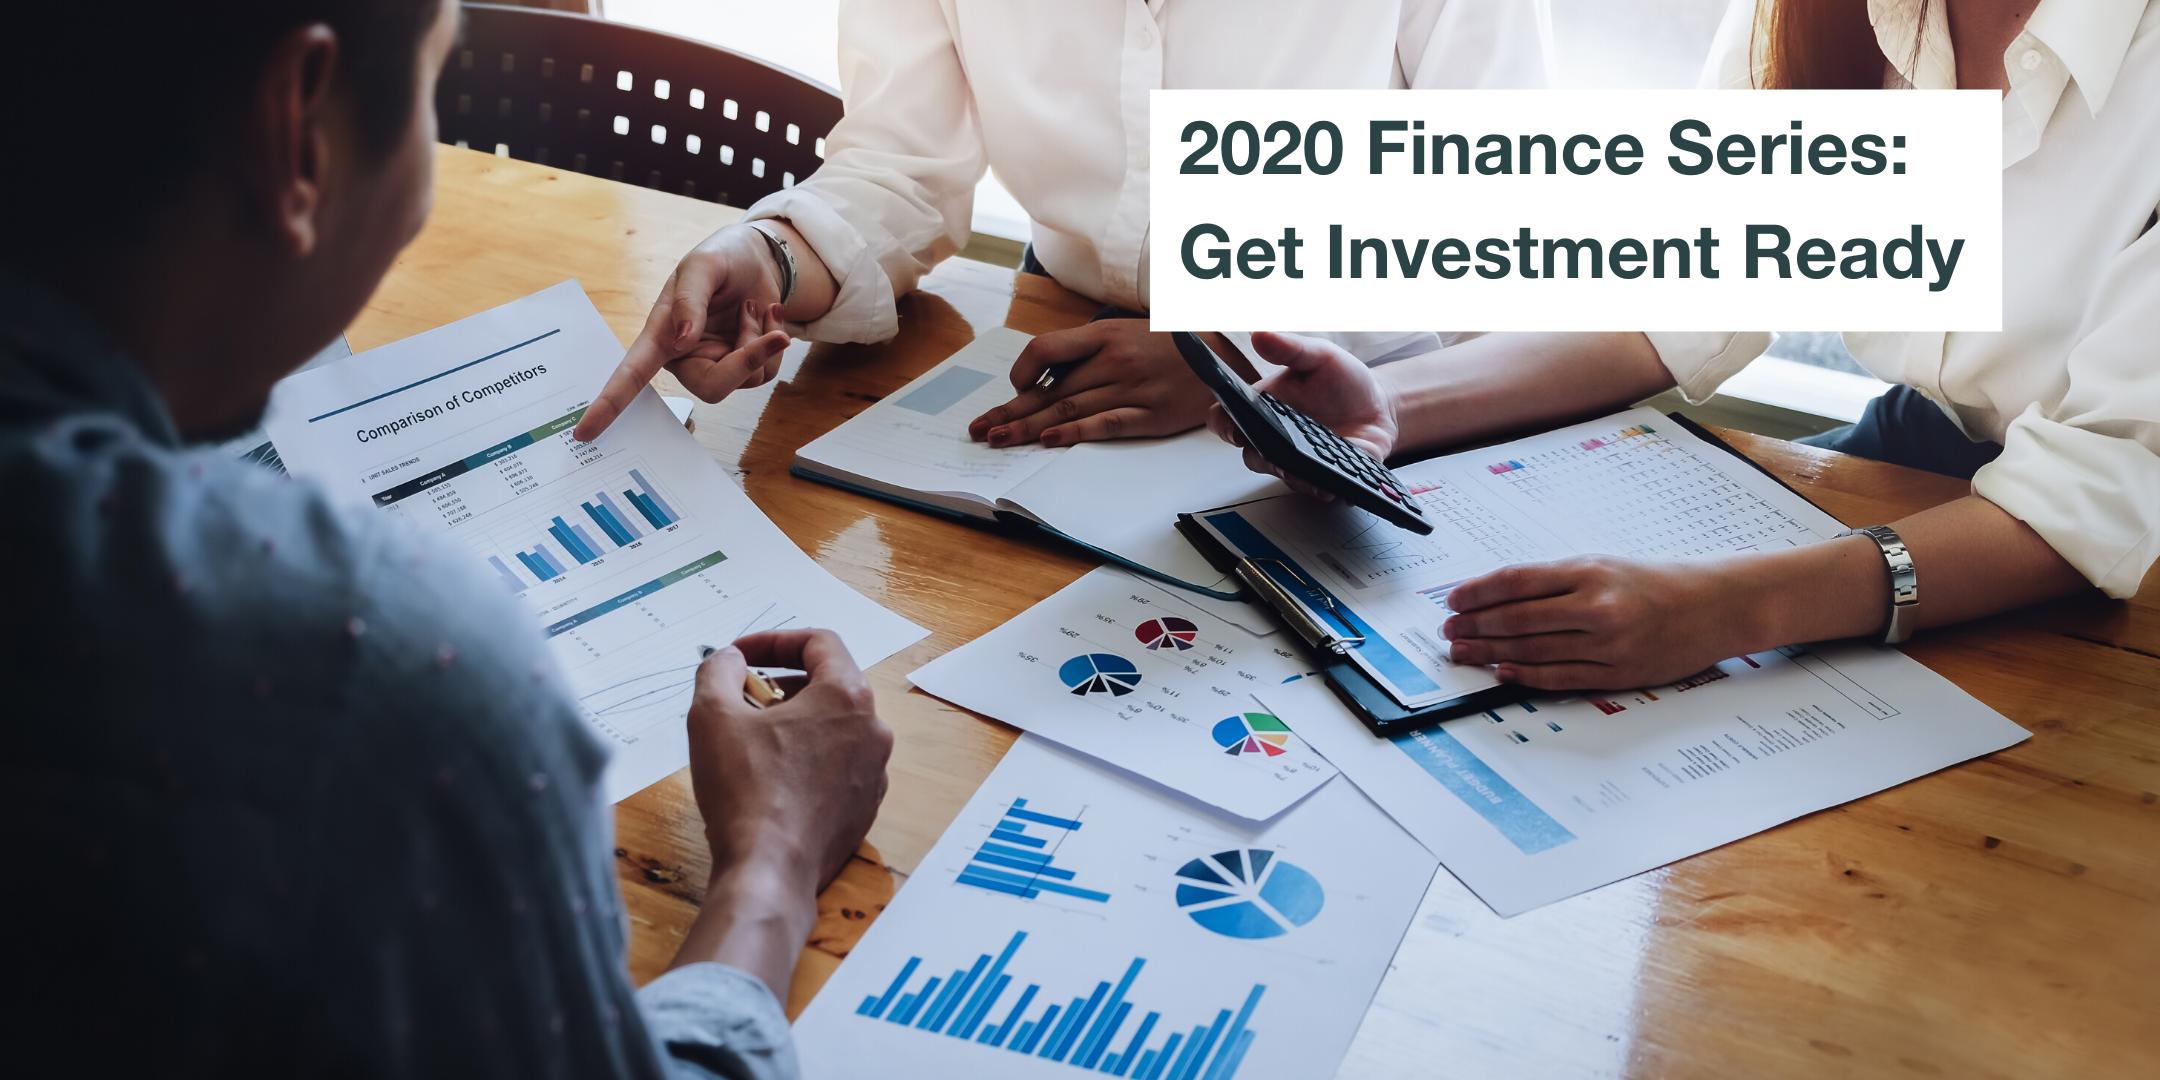 2020 Finance Series: 4th, 13th, 18th, 28th February